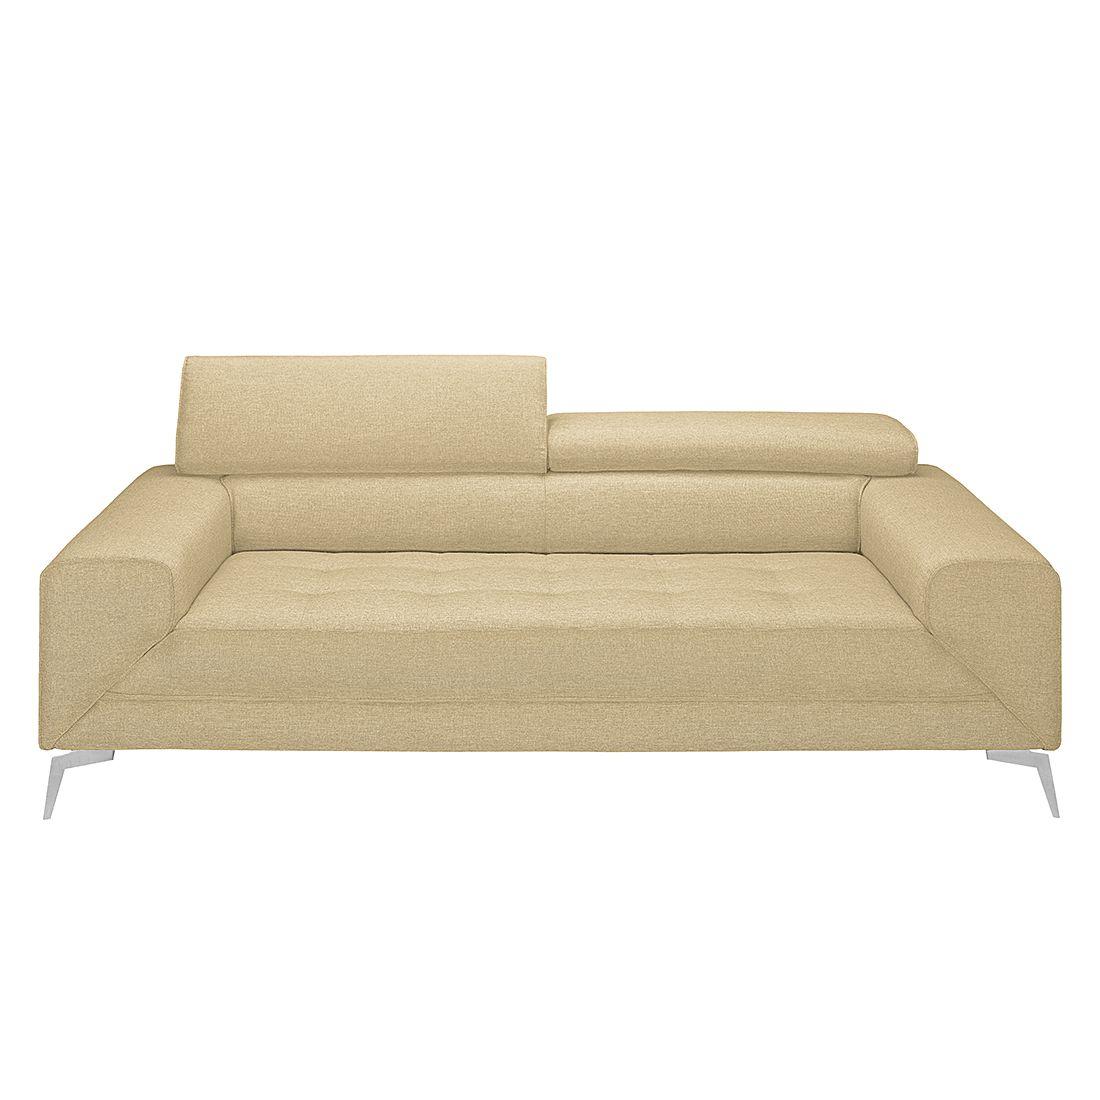 Sofa walden 3 sitzer webstoff beige loftscape for Sofa 7 sitzer